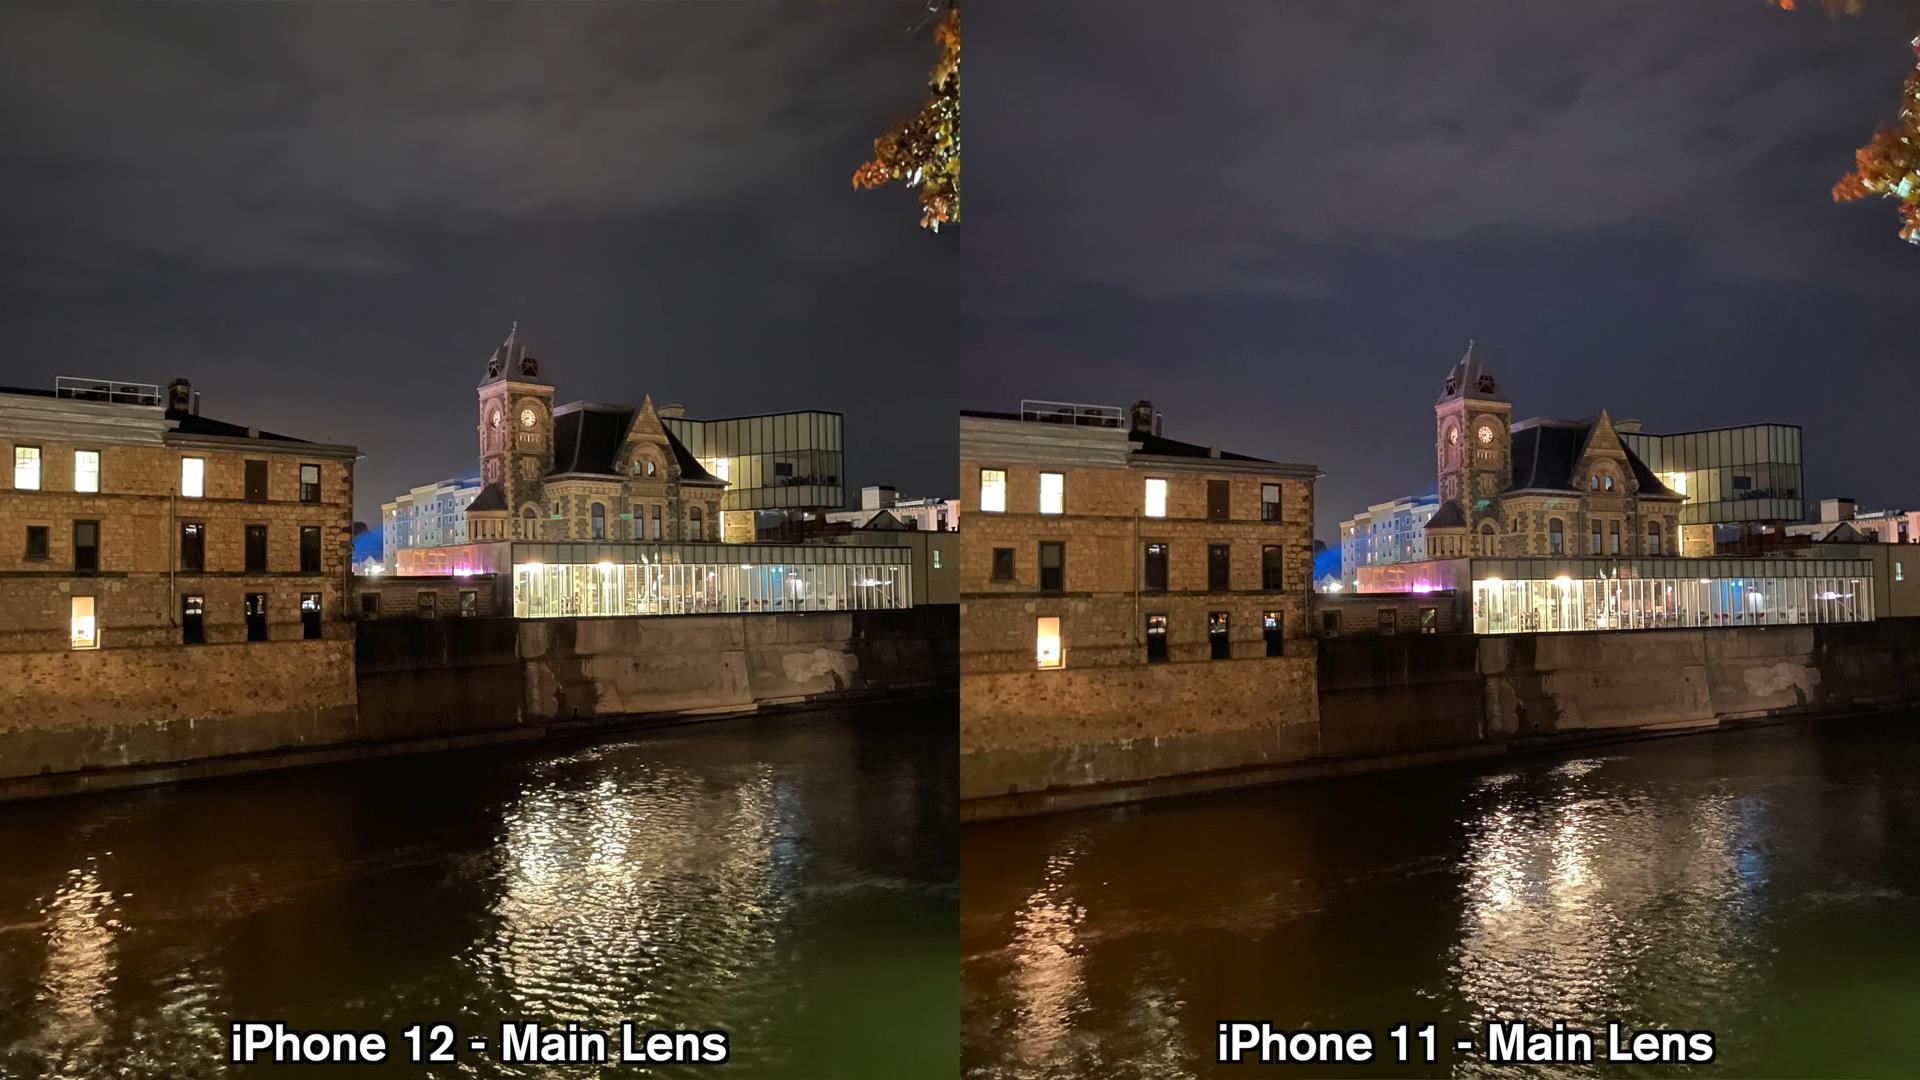 iPhone12和iPhone11拍照对比:都是双摄多大区别